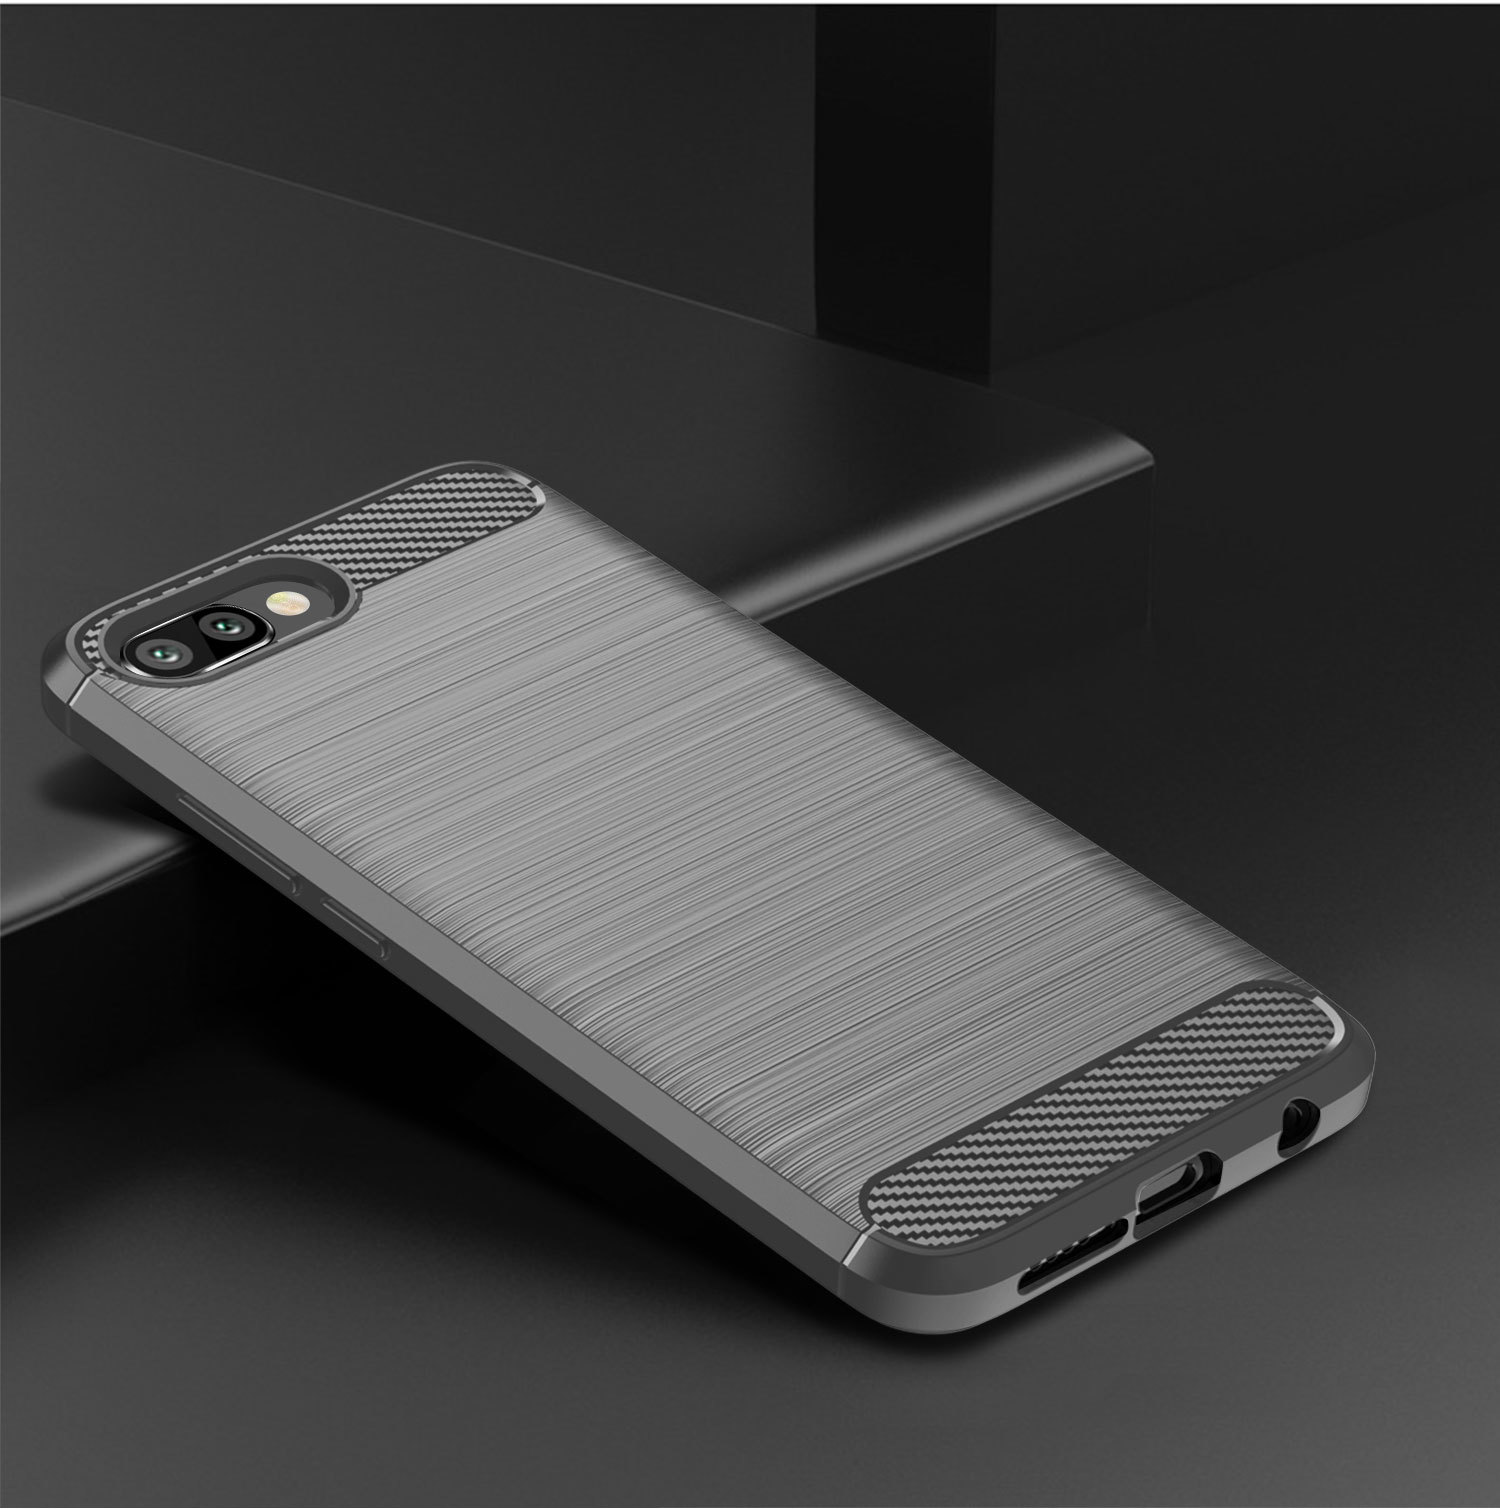 Чехол Honor 10 (10 GT) цвет Gray (серый), серия Carbon, Caseport